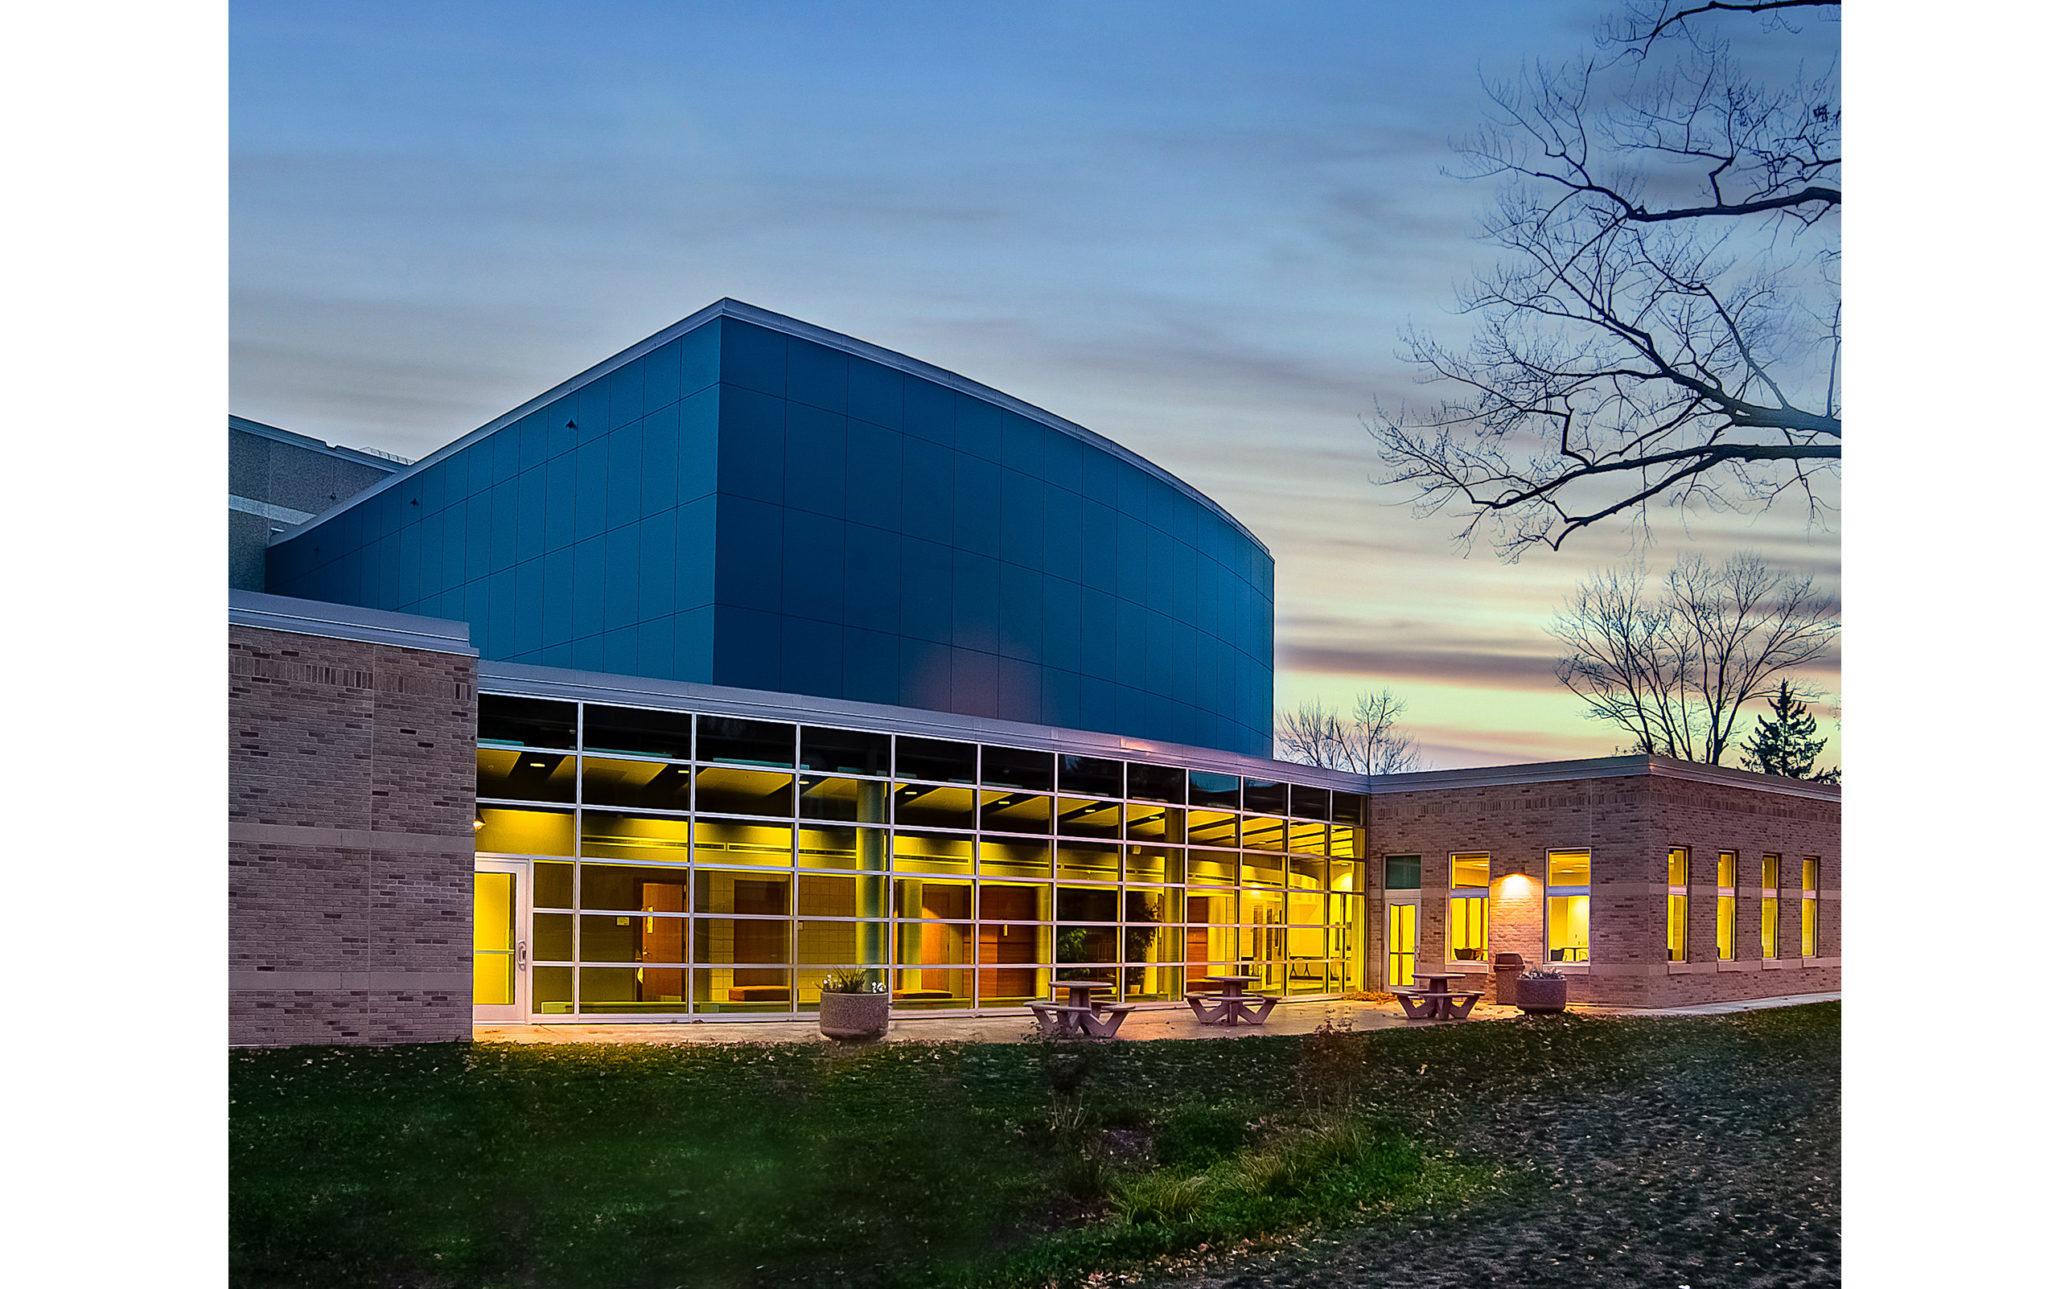 UWMC Center for Civic Engagement